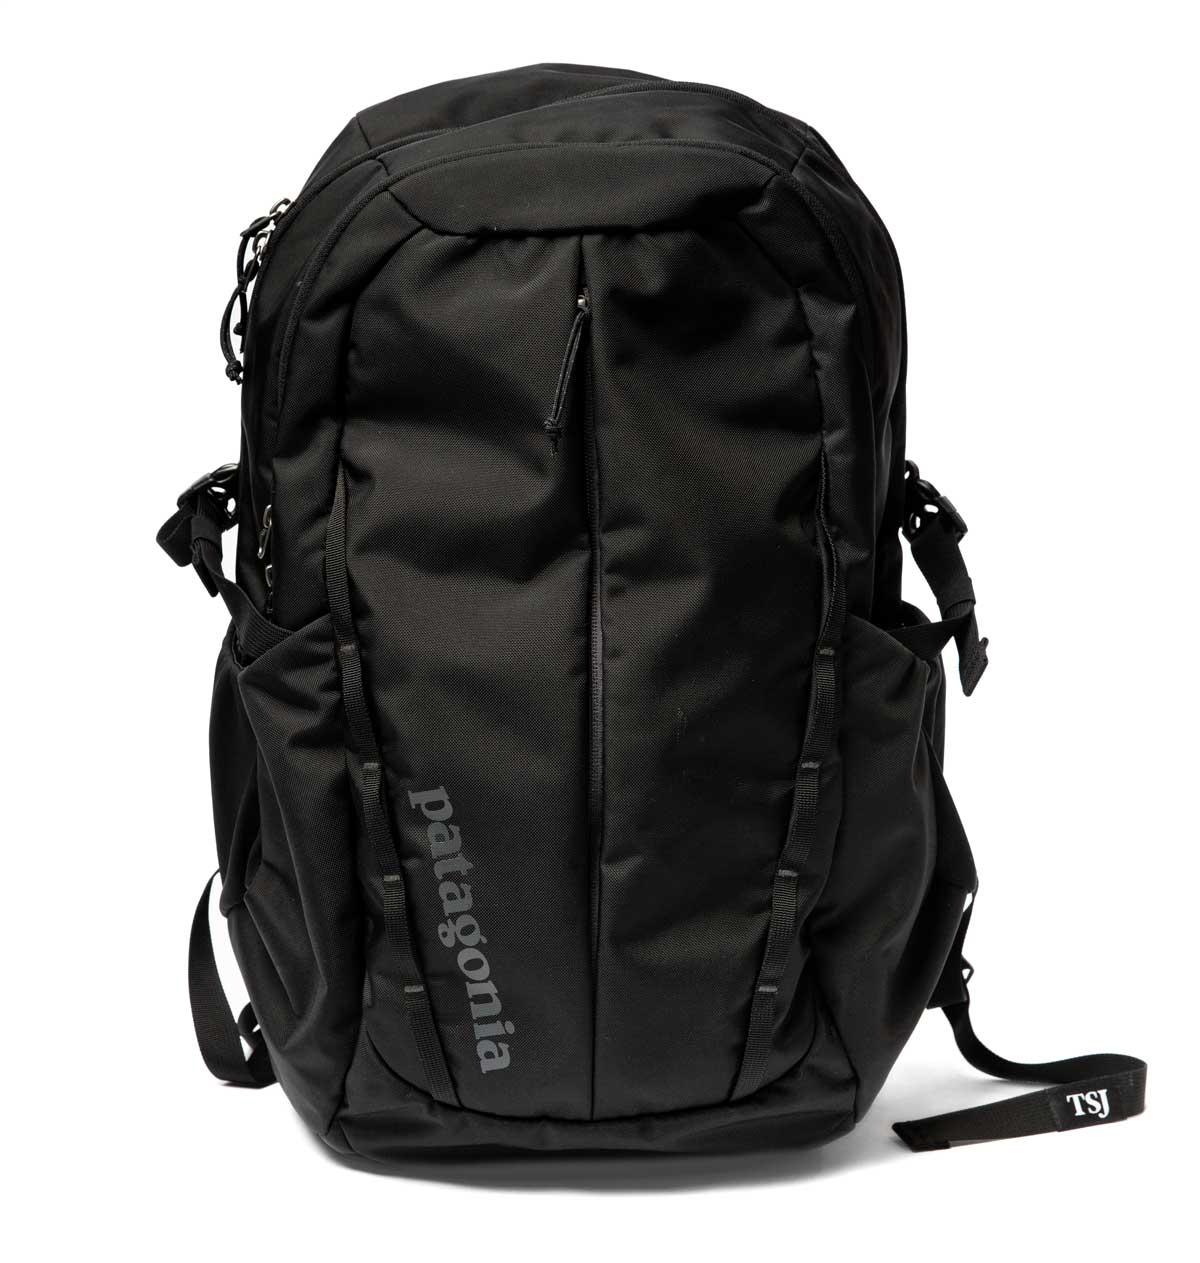 Refugio Backpack